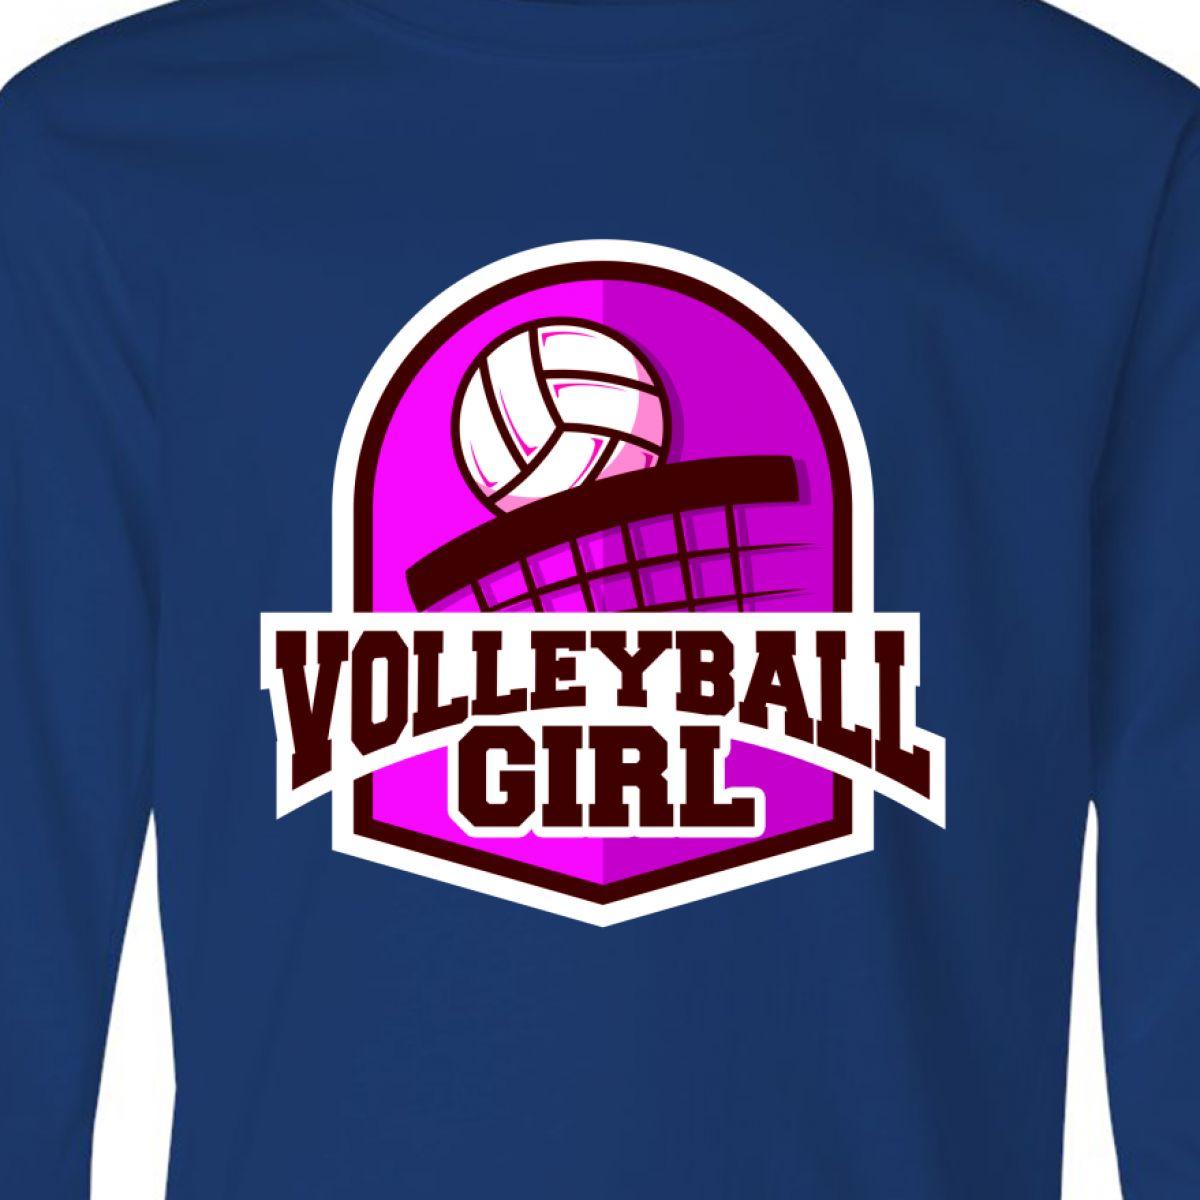 Inktastic Volleyball Girl Youth Long Sleeve T-Shirt Badge Tee Kids Children Teen